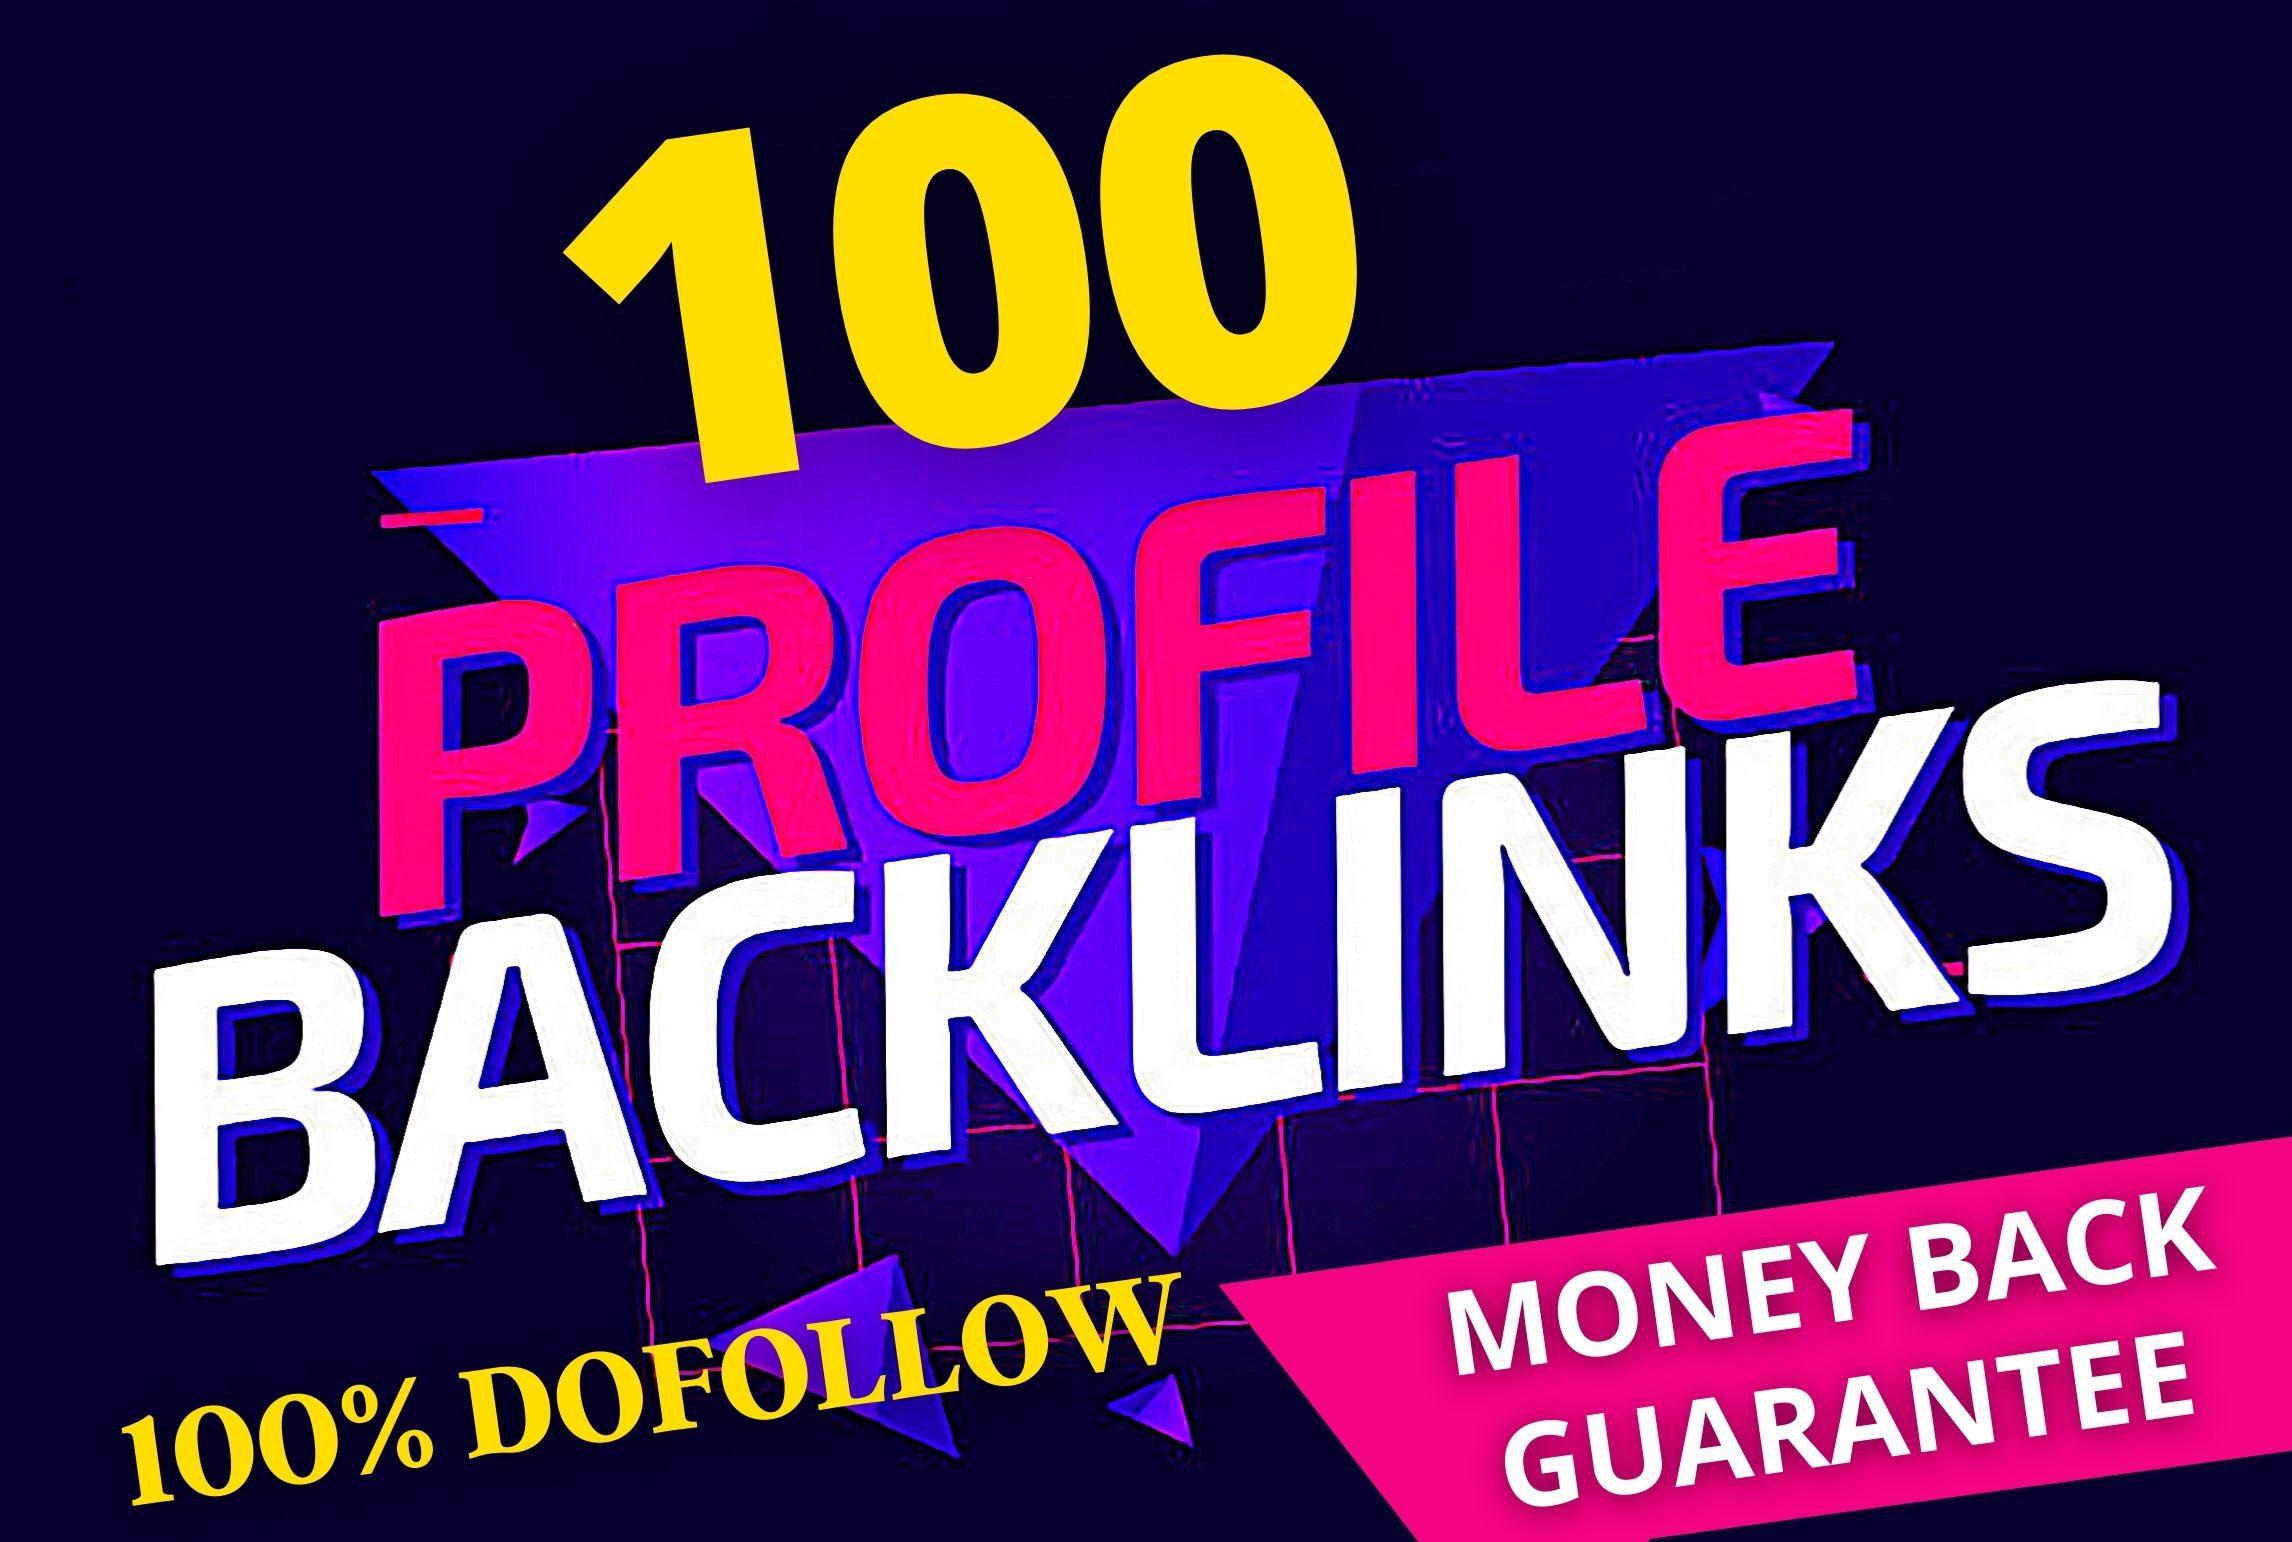 I will do 100 Dofollow 80+DA PA Pr9 Profile Backlinks creations SEO Link building